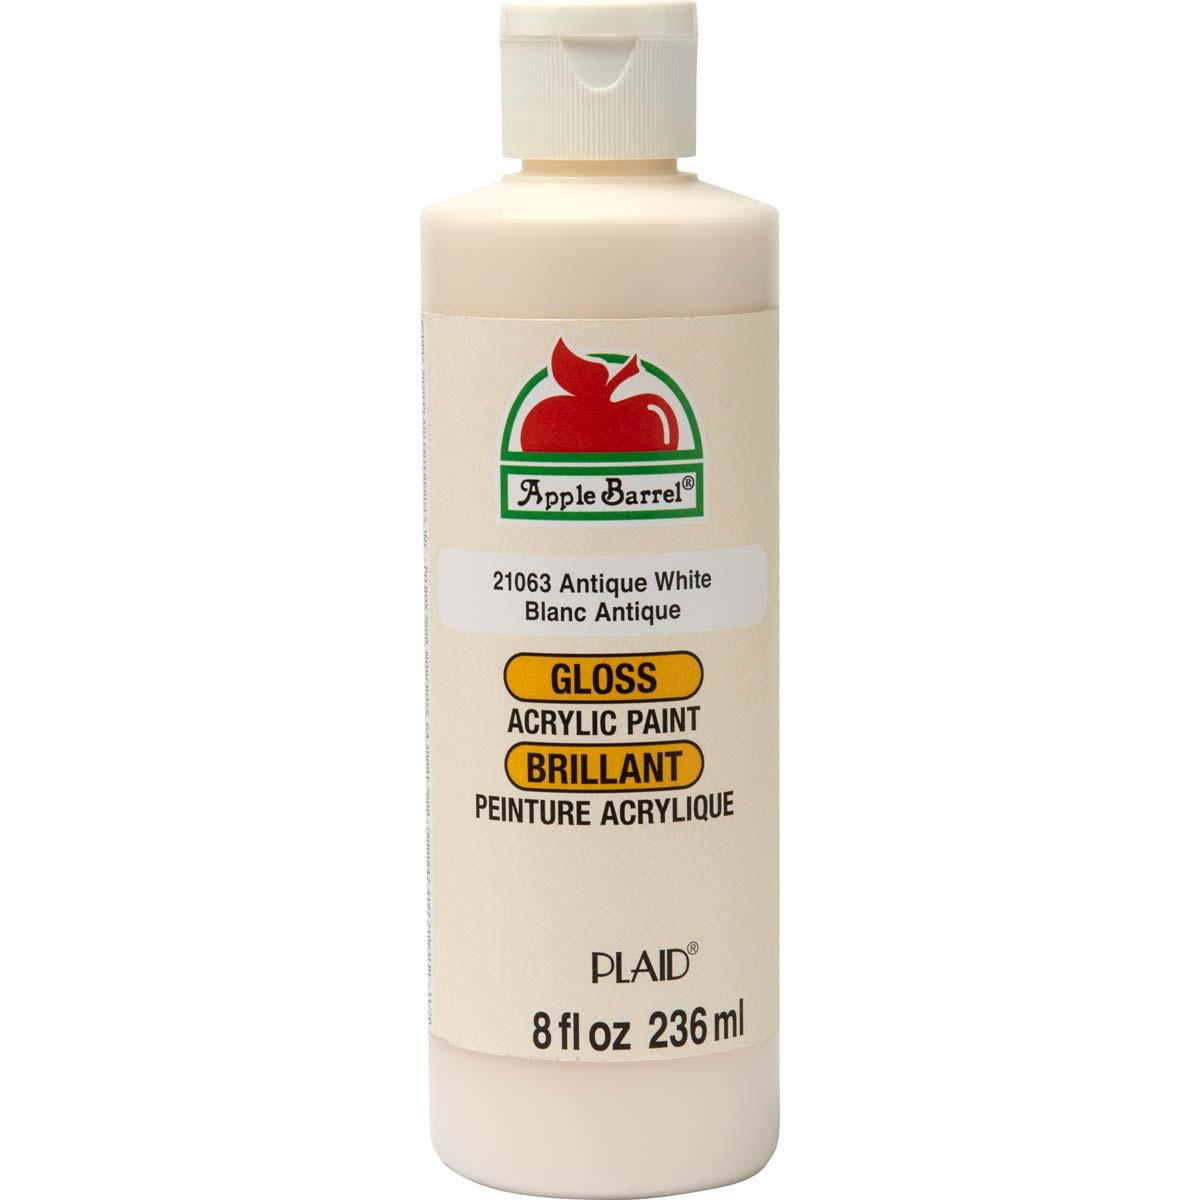 Apple Barrel ® Gloss™ - Antique White, 8 oz. - 21063